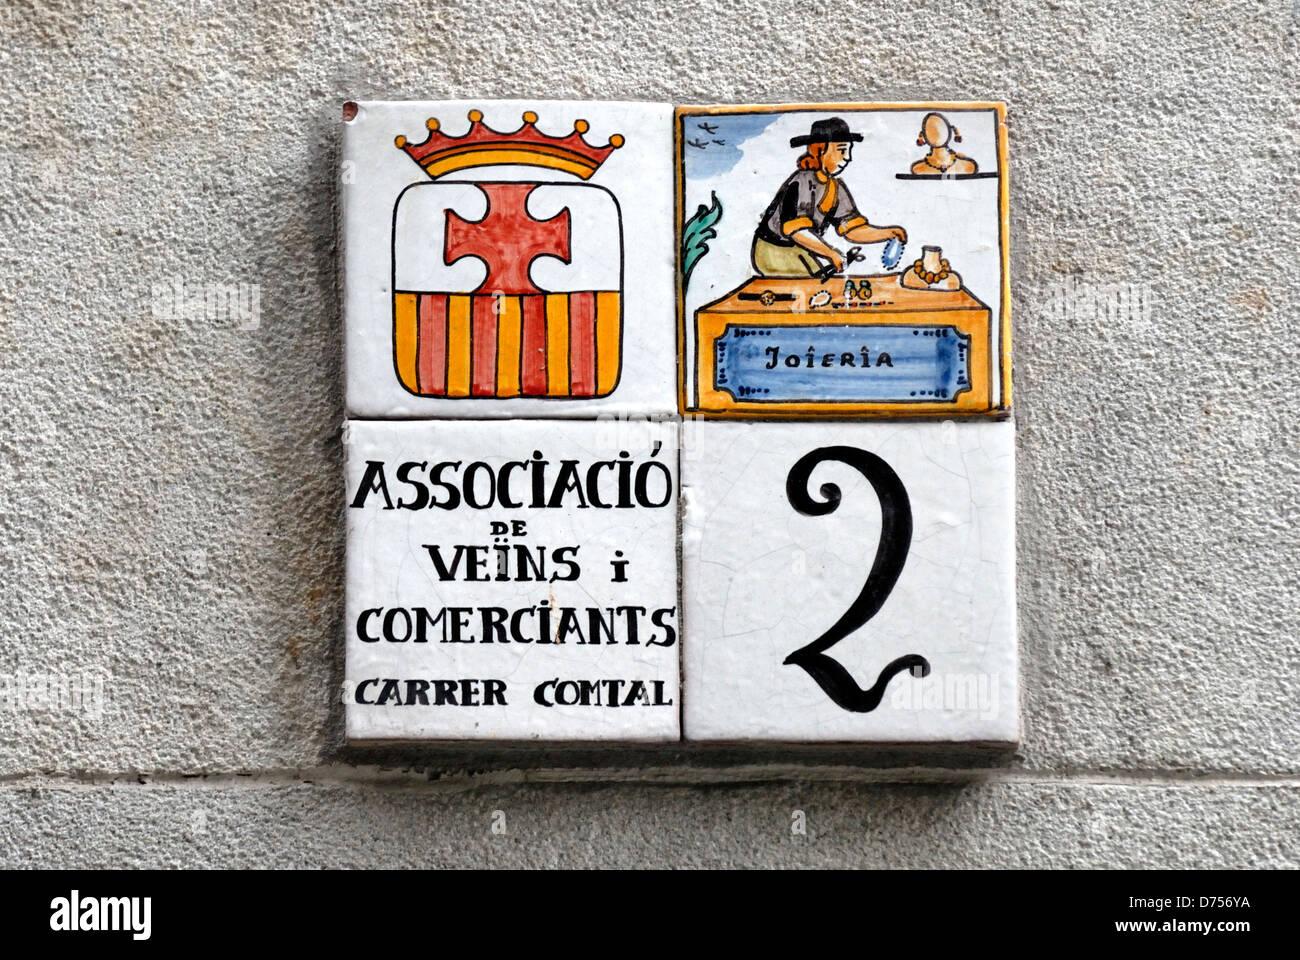 Spain, Catalonia, Barcelona. Painted ceramic tiles street sign - house number 2 Carrer Comtal. Jeweller - Stock Image